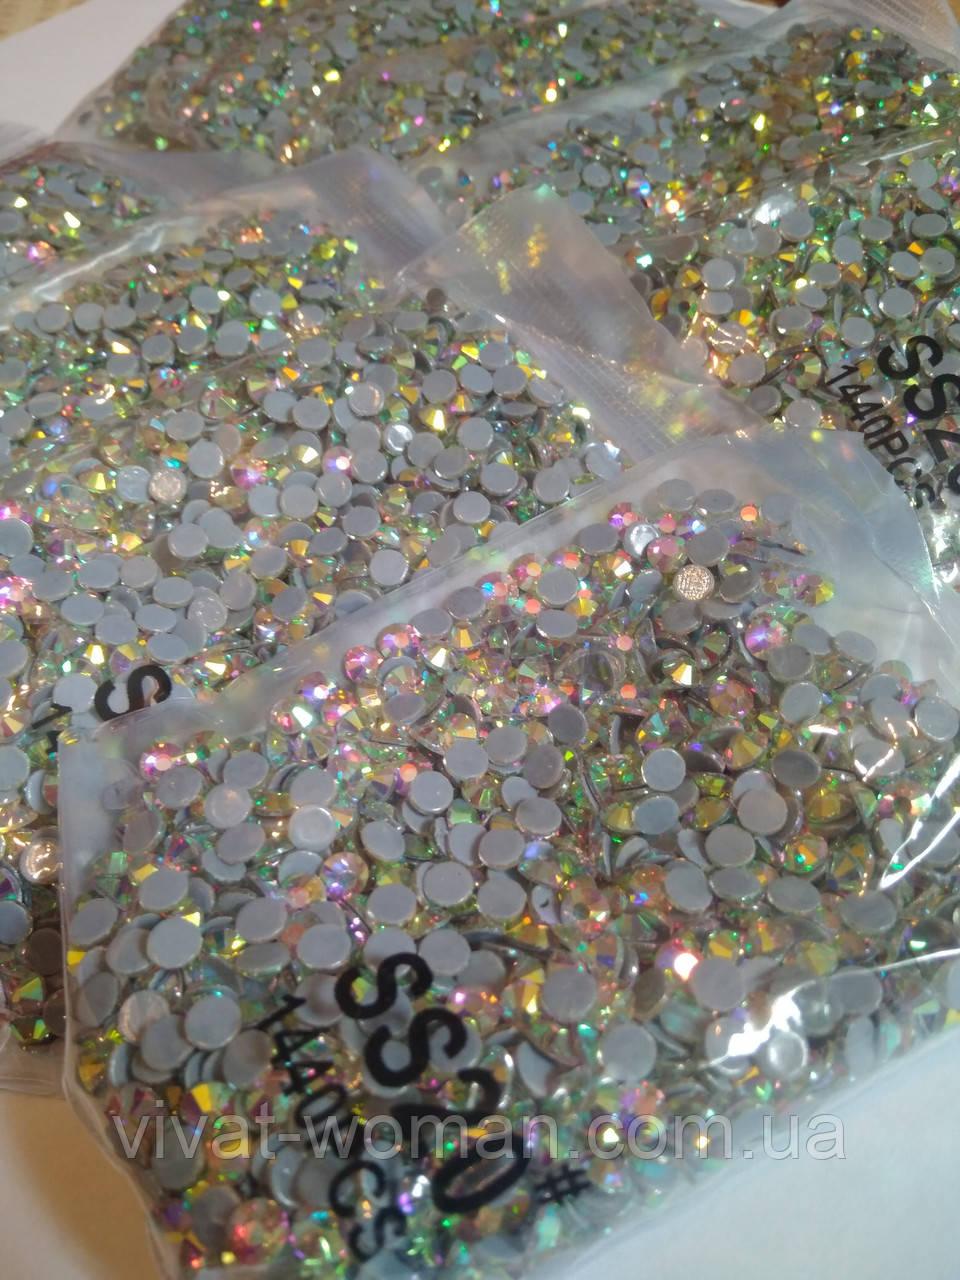 Опт. Стразы премиум Best термоклеевые, Crystal AB ss20 (4,80 мм), 10 уп /14400 шт